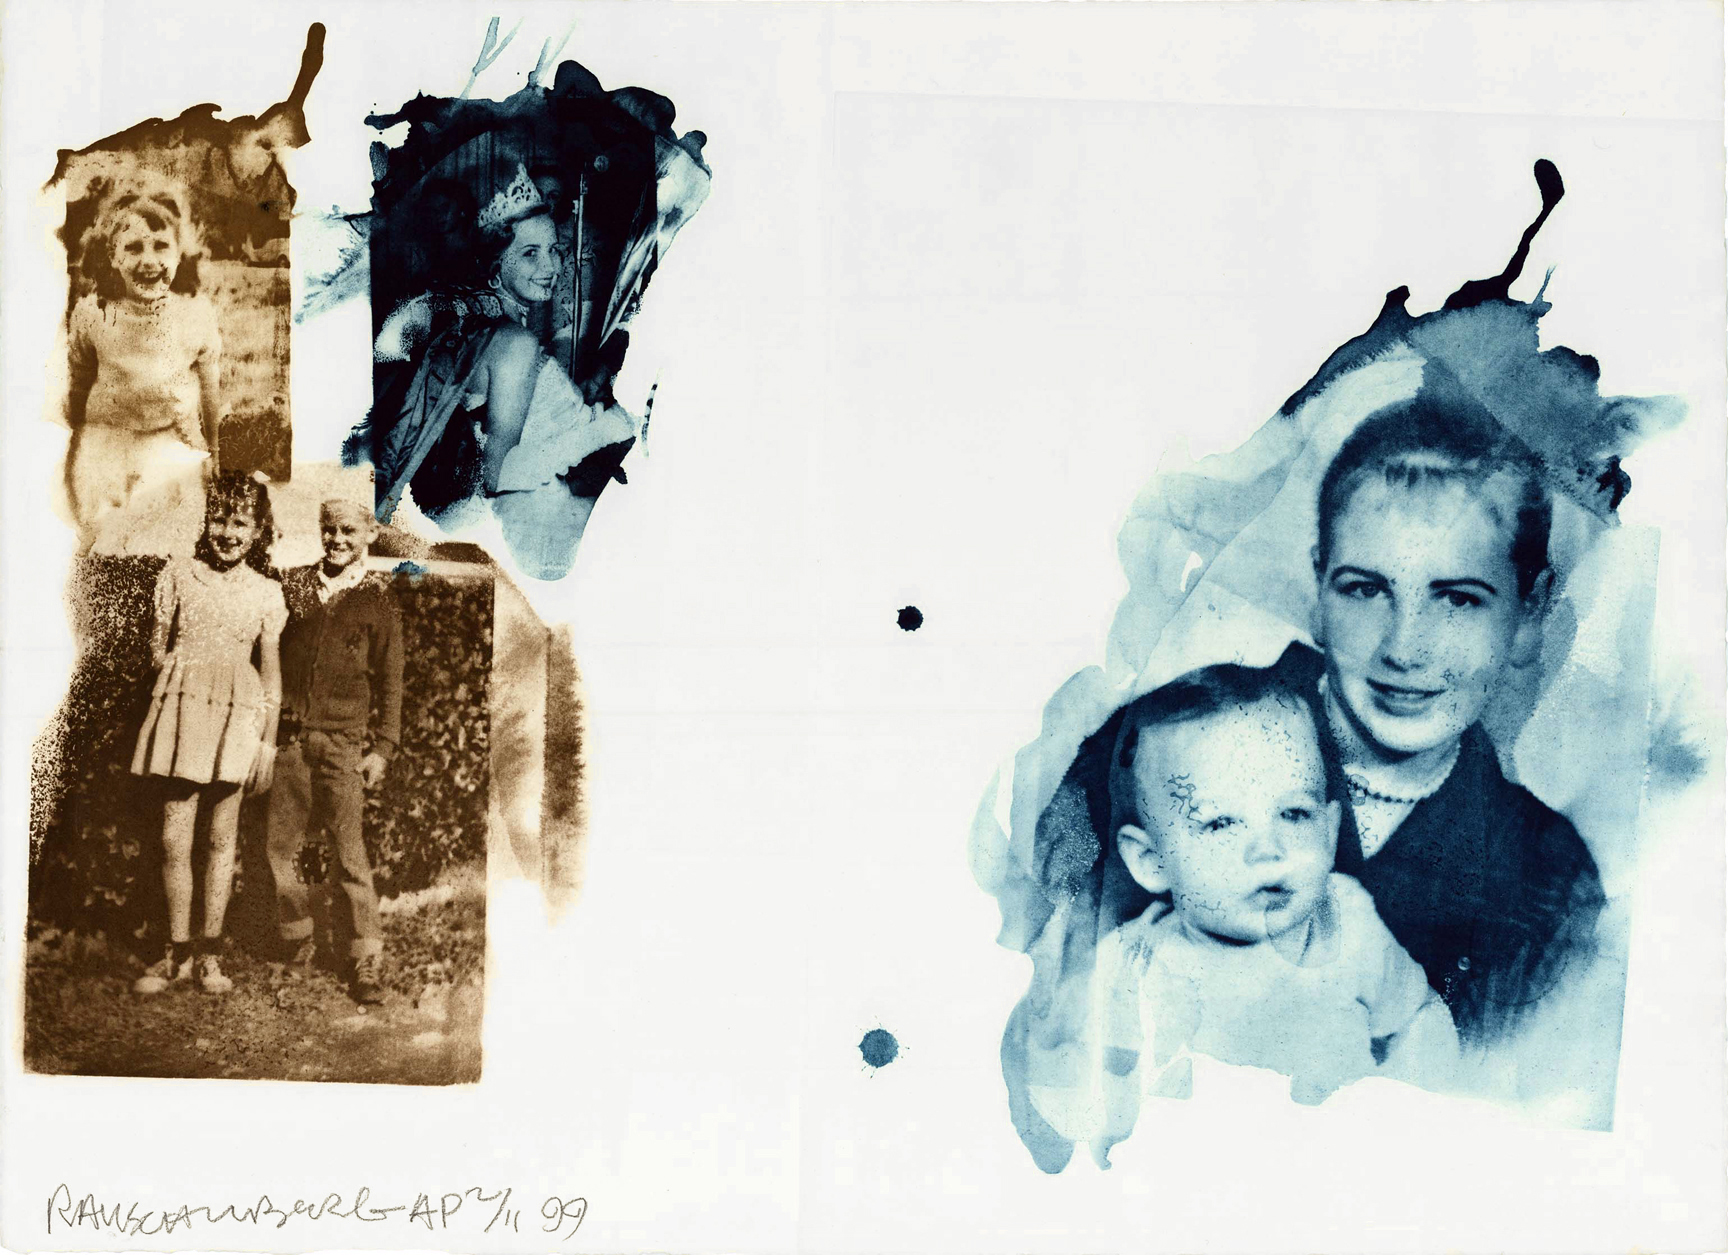 Bubba's Sister (Ruminations), 2000. 200.E030.